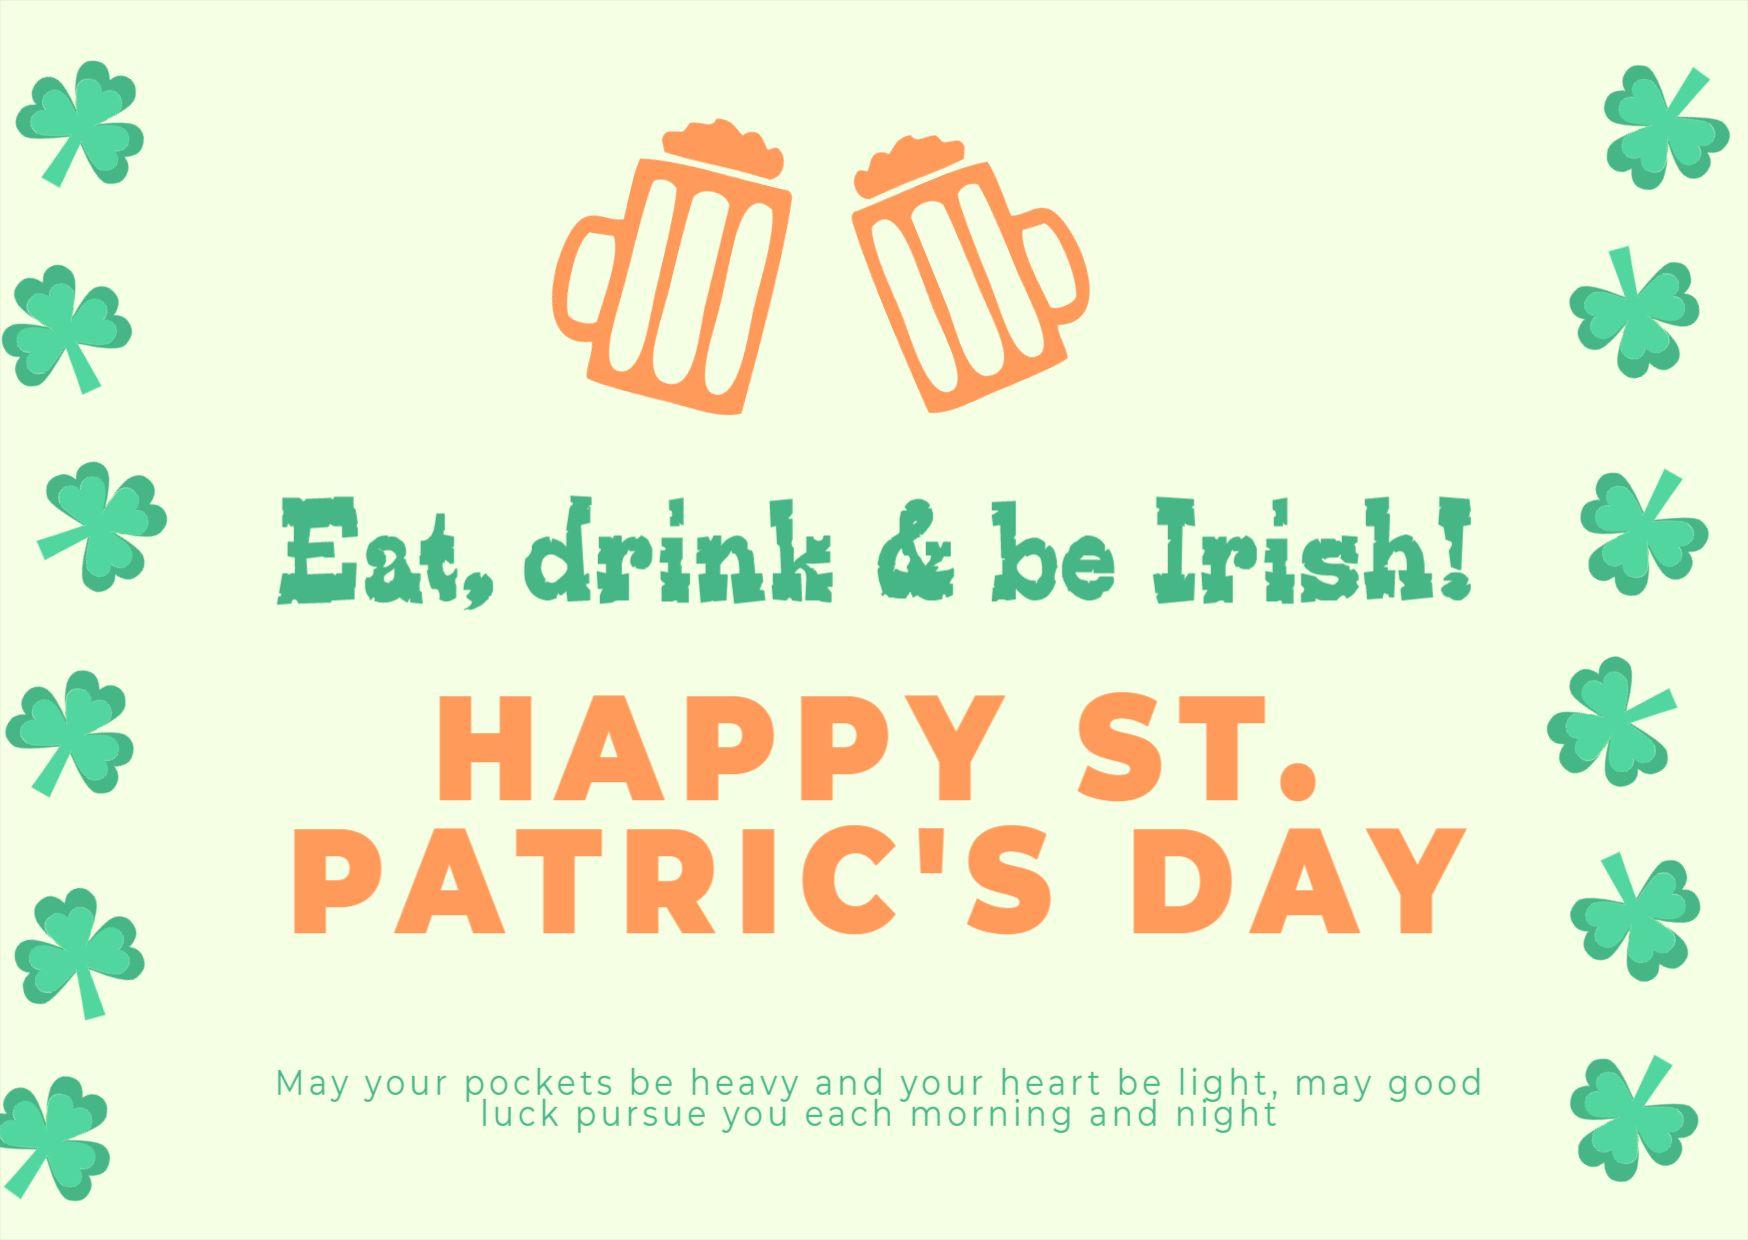 St. Patricks Day Celebration Greetings Template